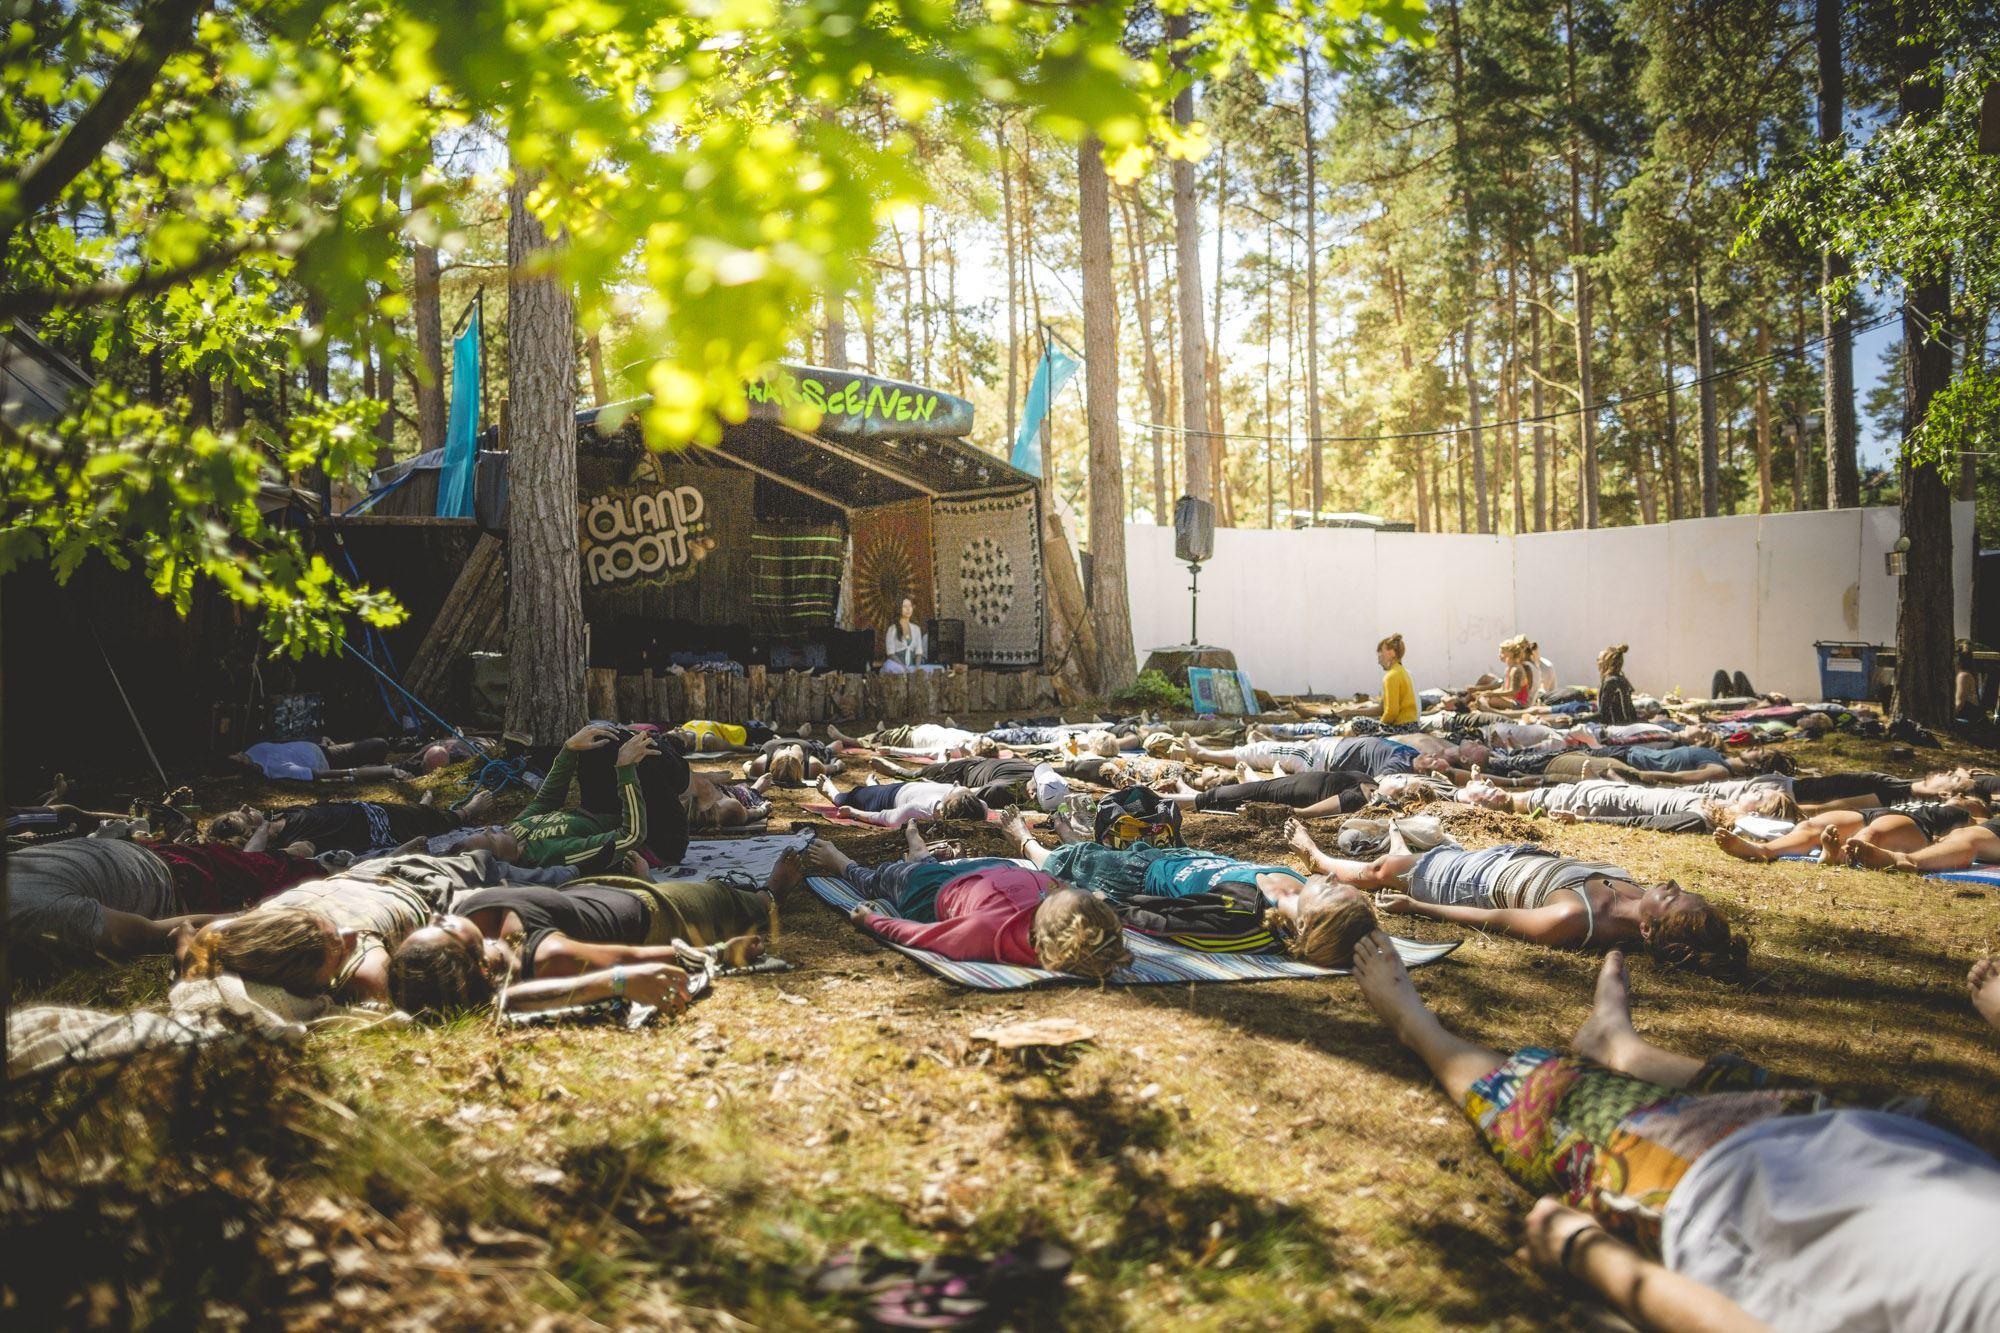 Kortfilm om sveriges mysigaste festival - Öland Roots